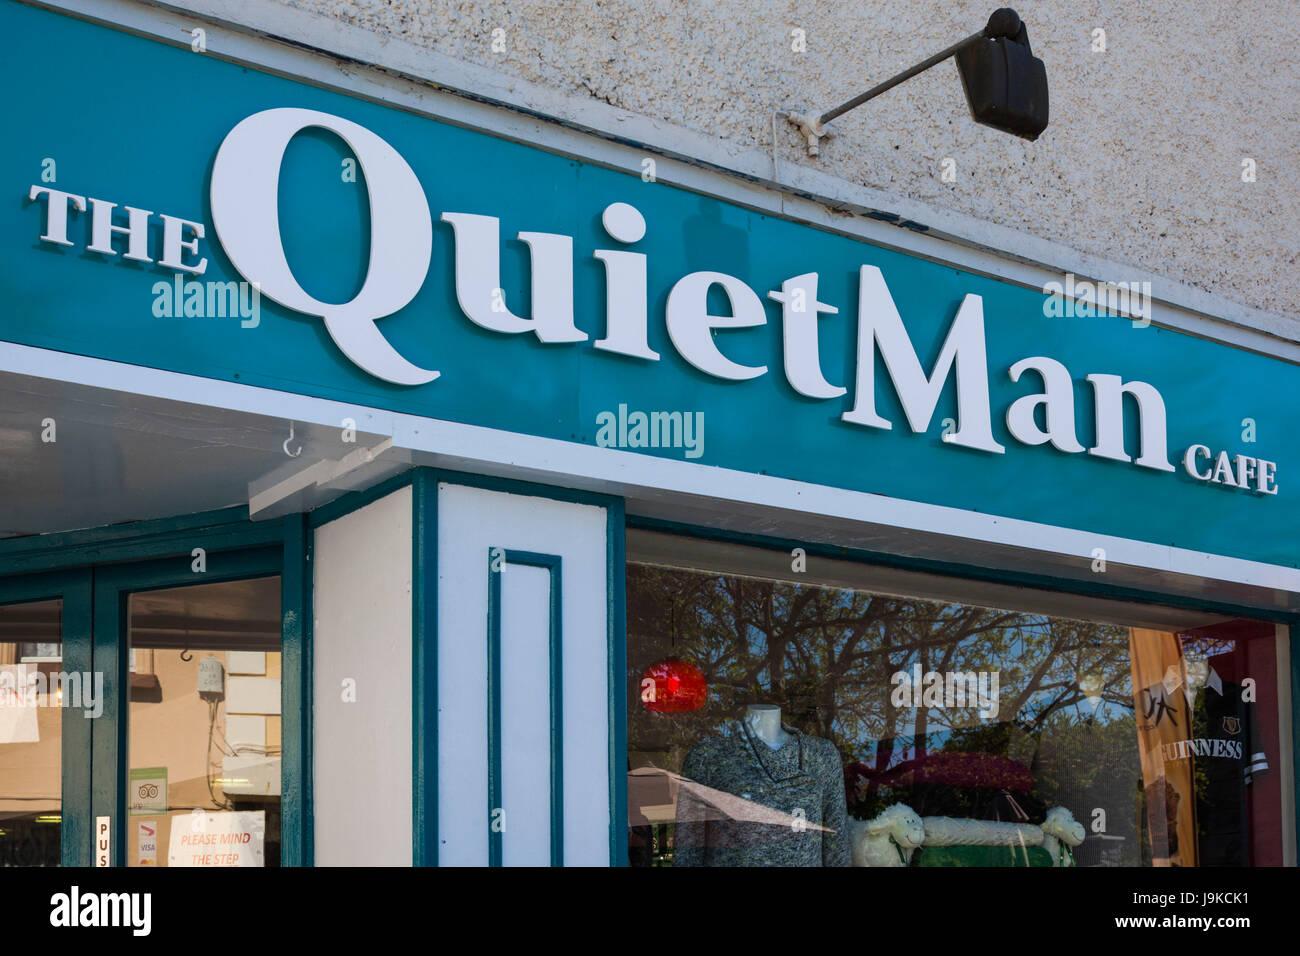 Irland, County Galway, Cong, der ruhige Mann Cafe, benannt nach der John Wayne Film in Cong, 1951 Stockbild